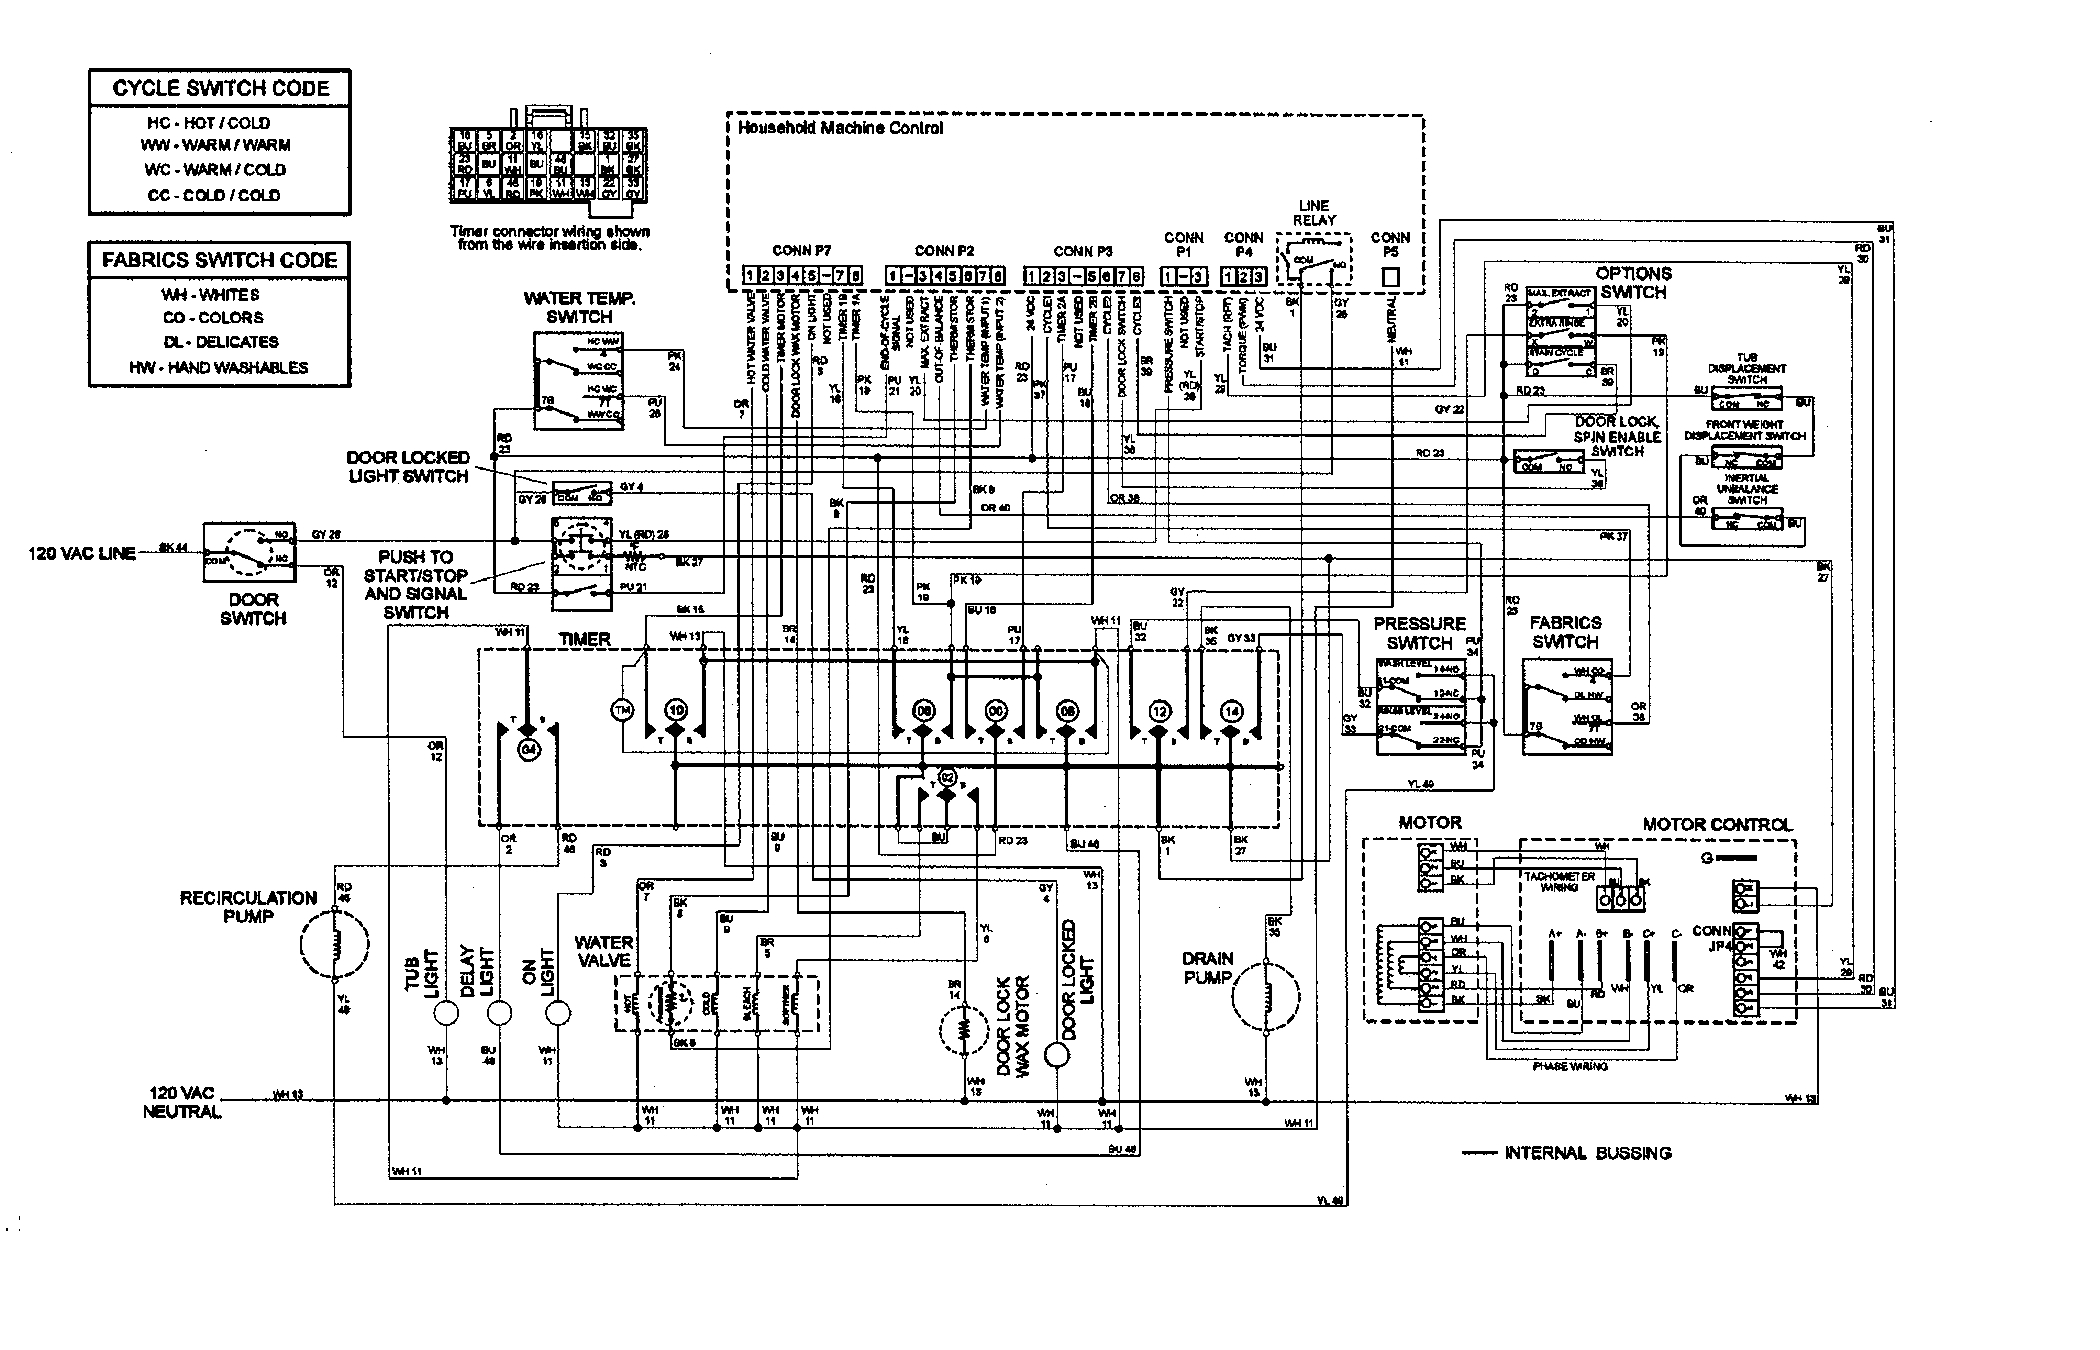 maytag dishwasher wiring diagram zeta addressable fire alarm for namemaytag dryer best library microwave